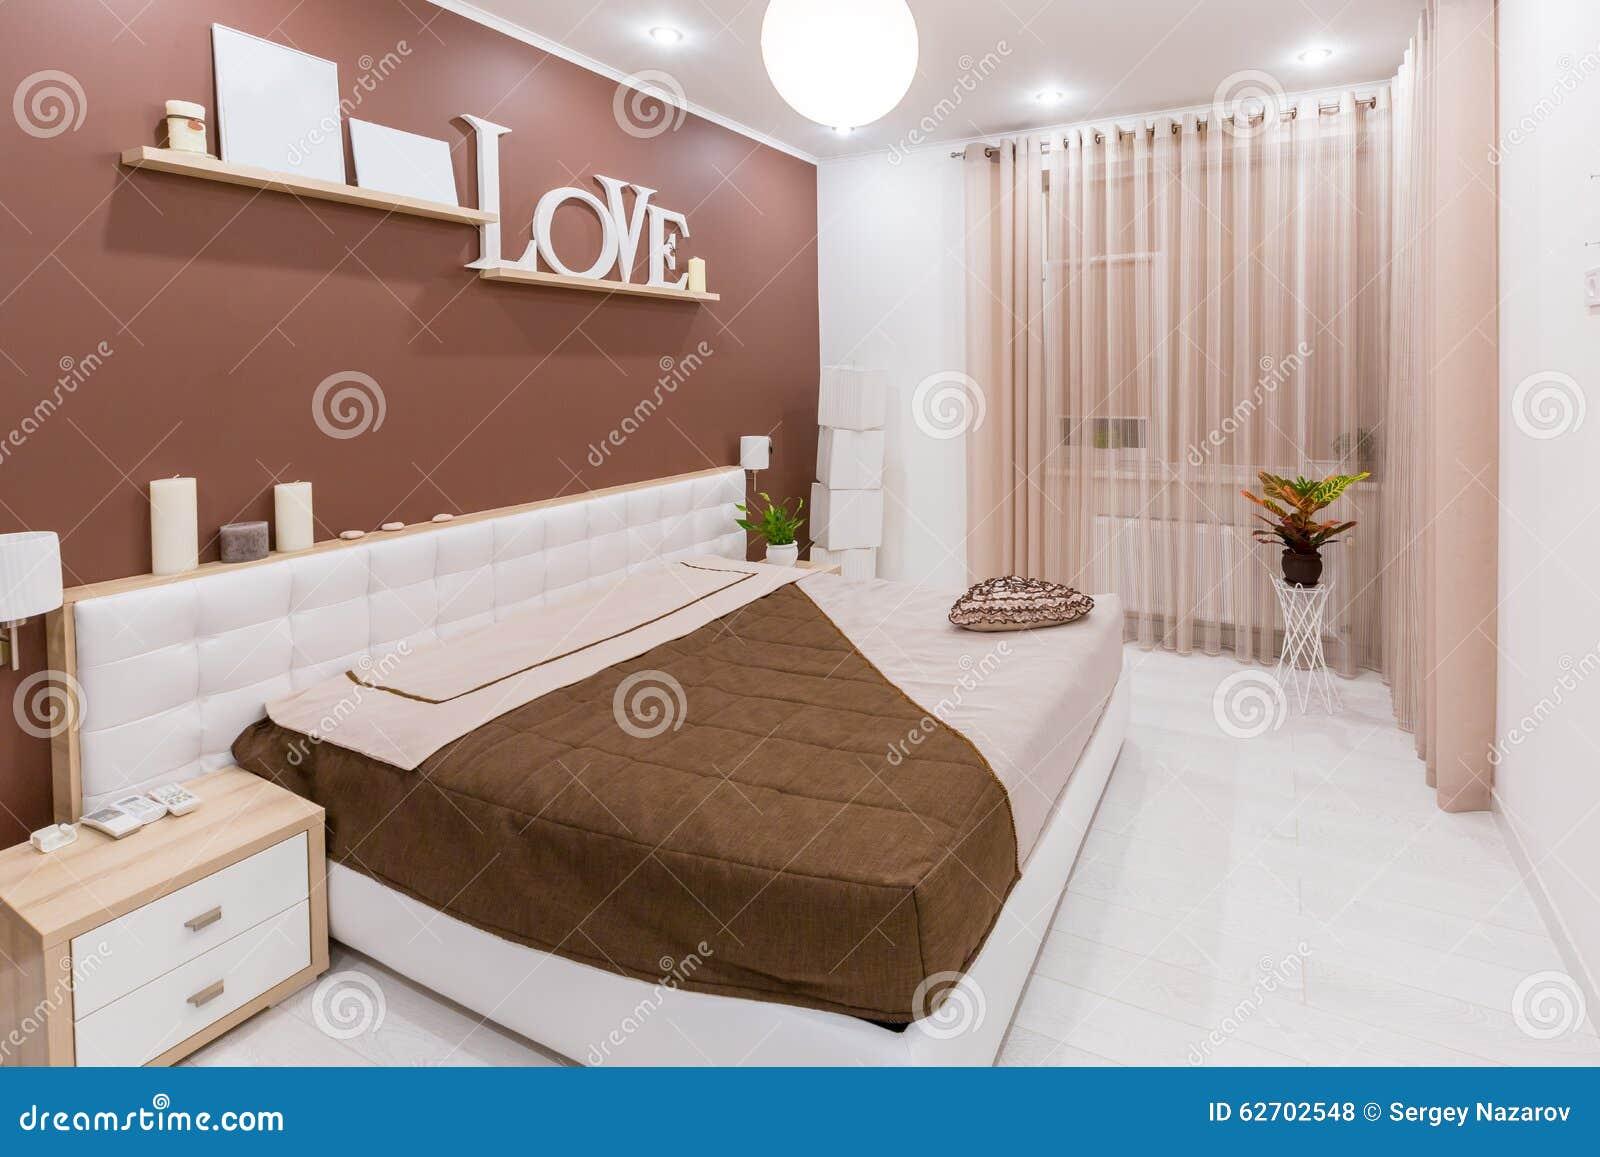 Modern minimalism style bedroom interior in light warm tones